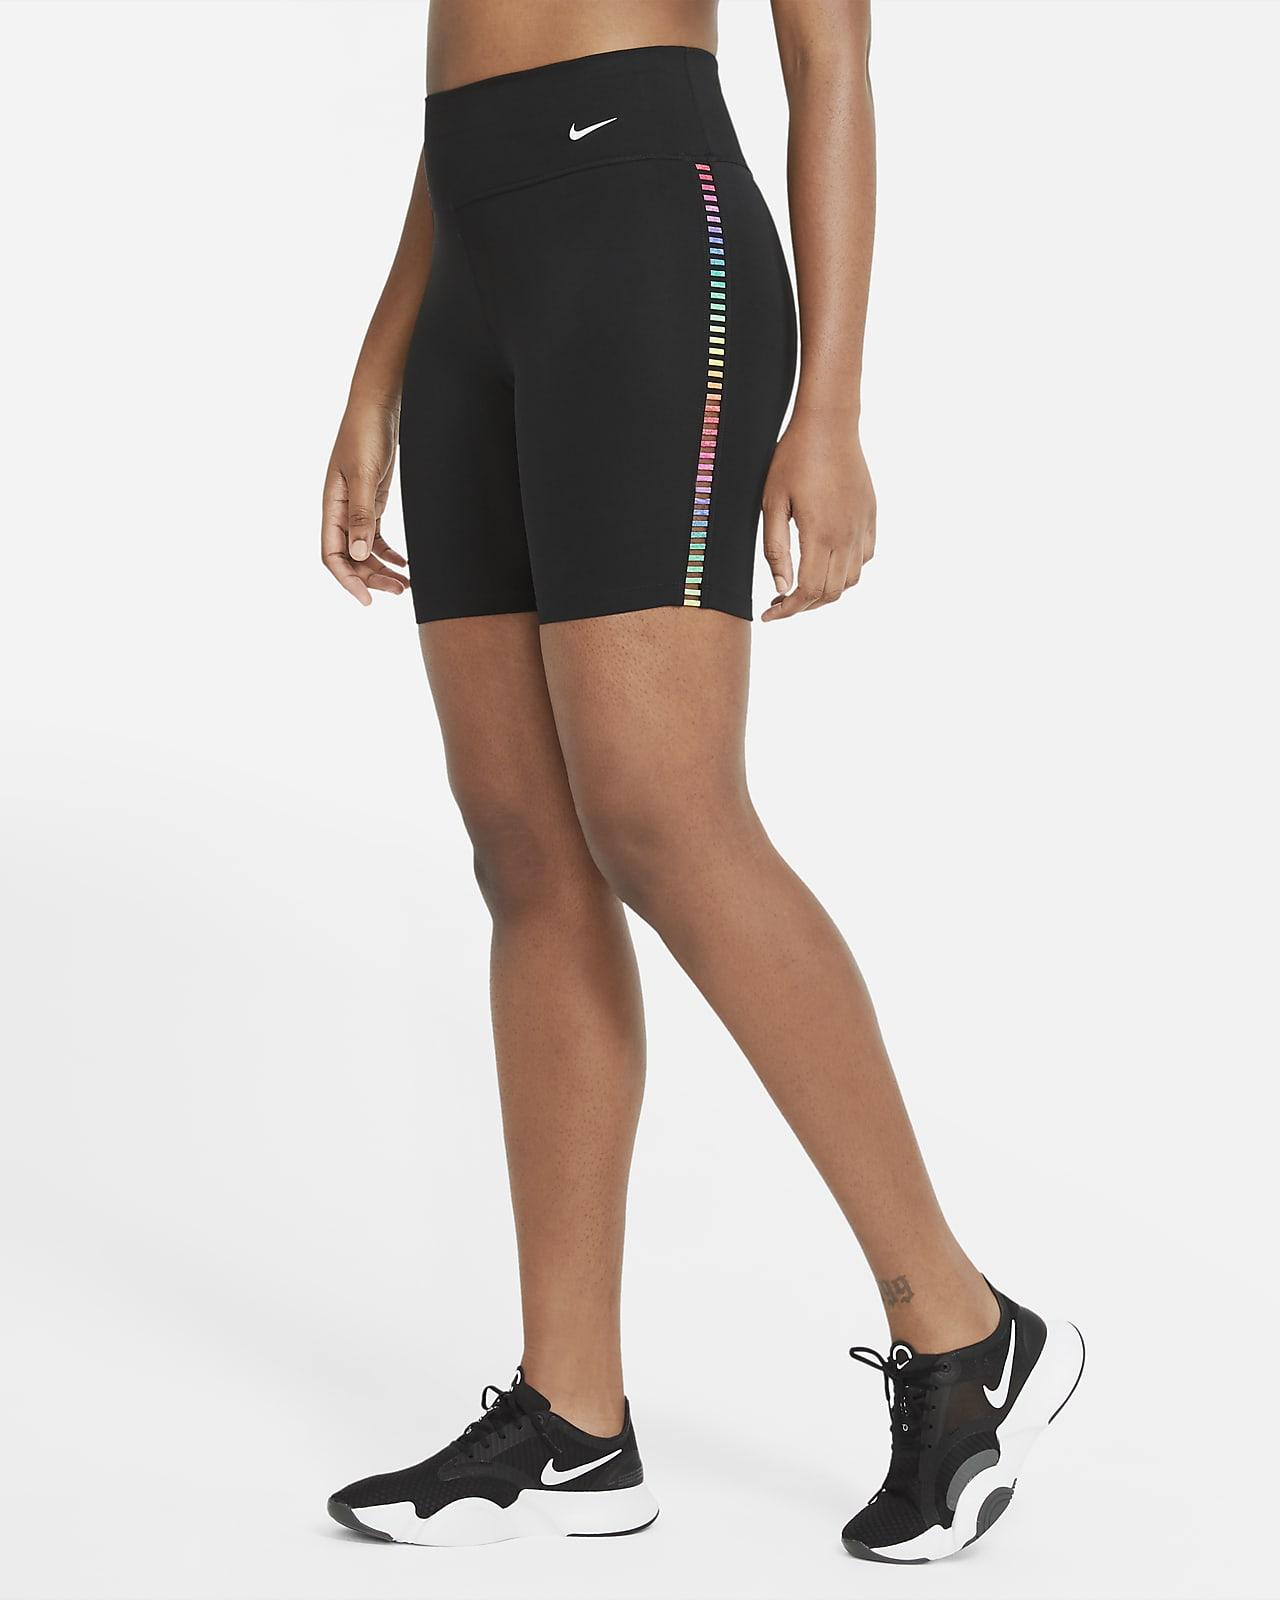 Shorts de 18 cm para mujer Nike One Rainbow Ladder